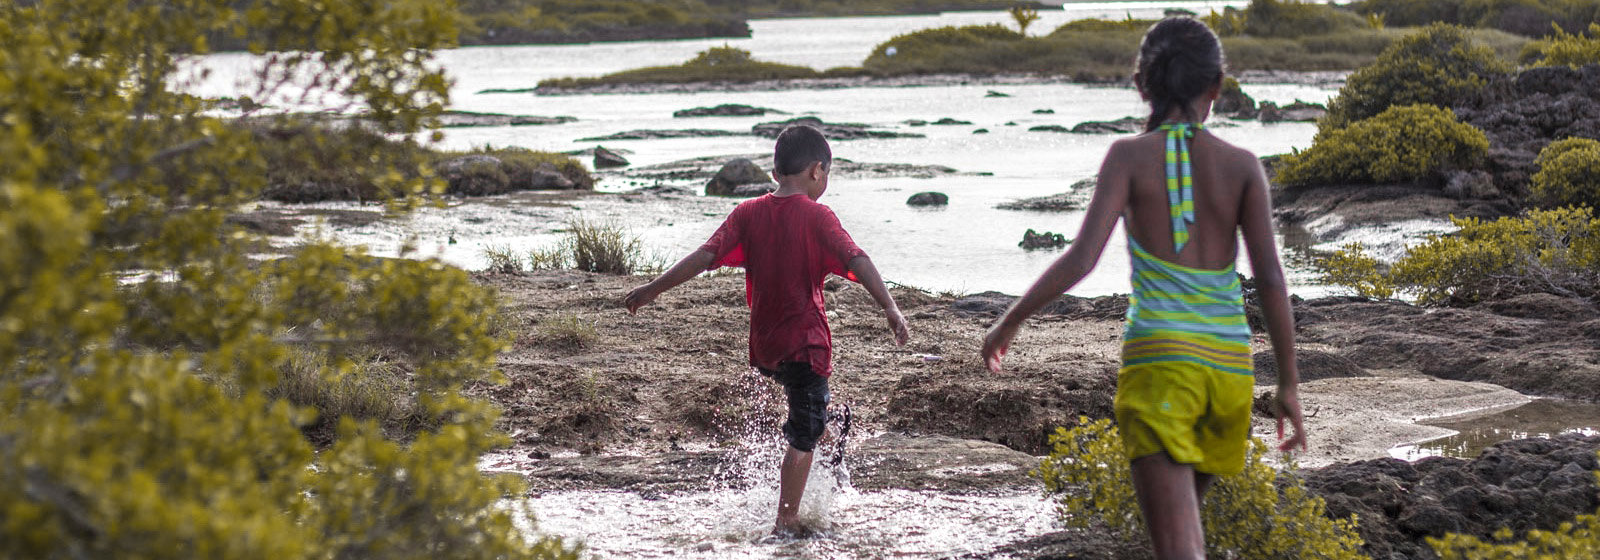 Guam children kids splashing in Inarajan Pools, Guam